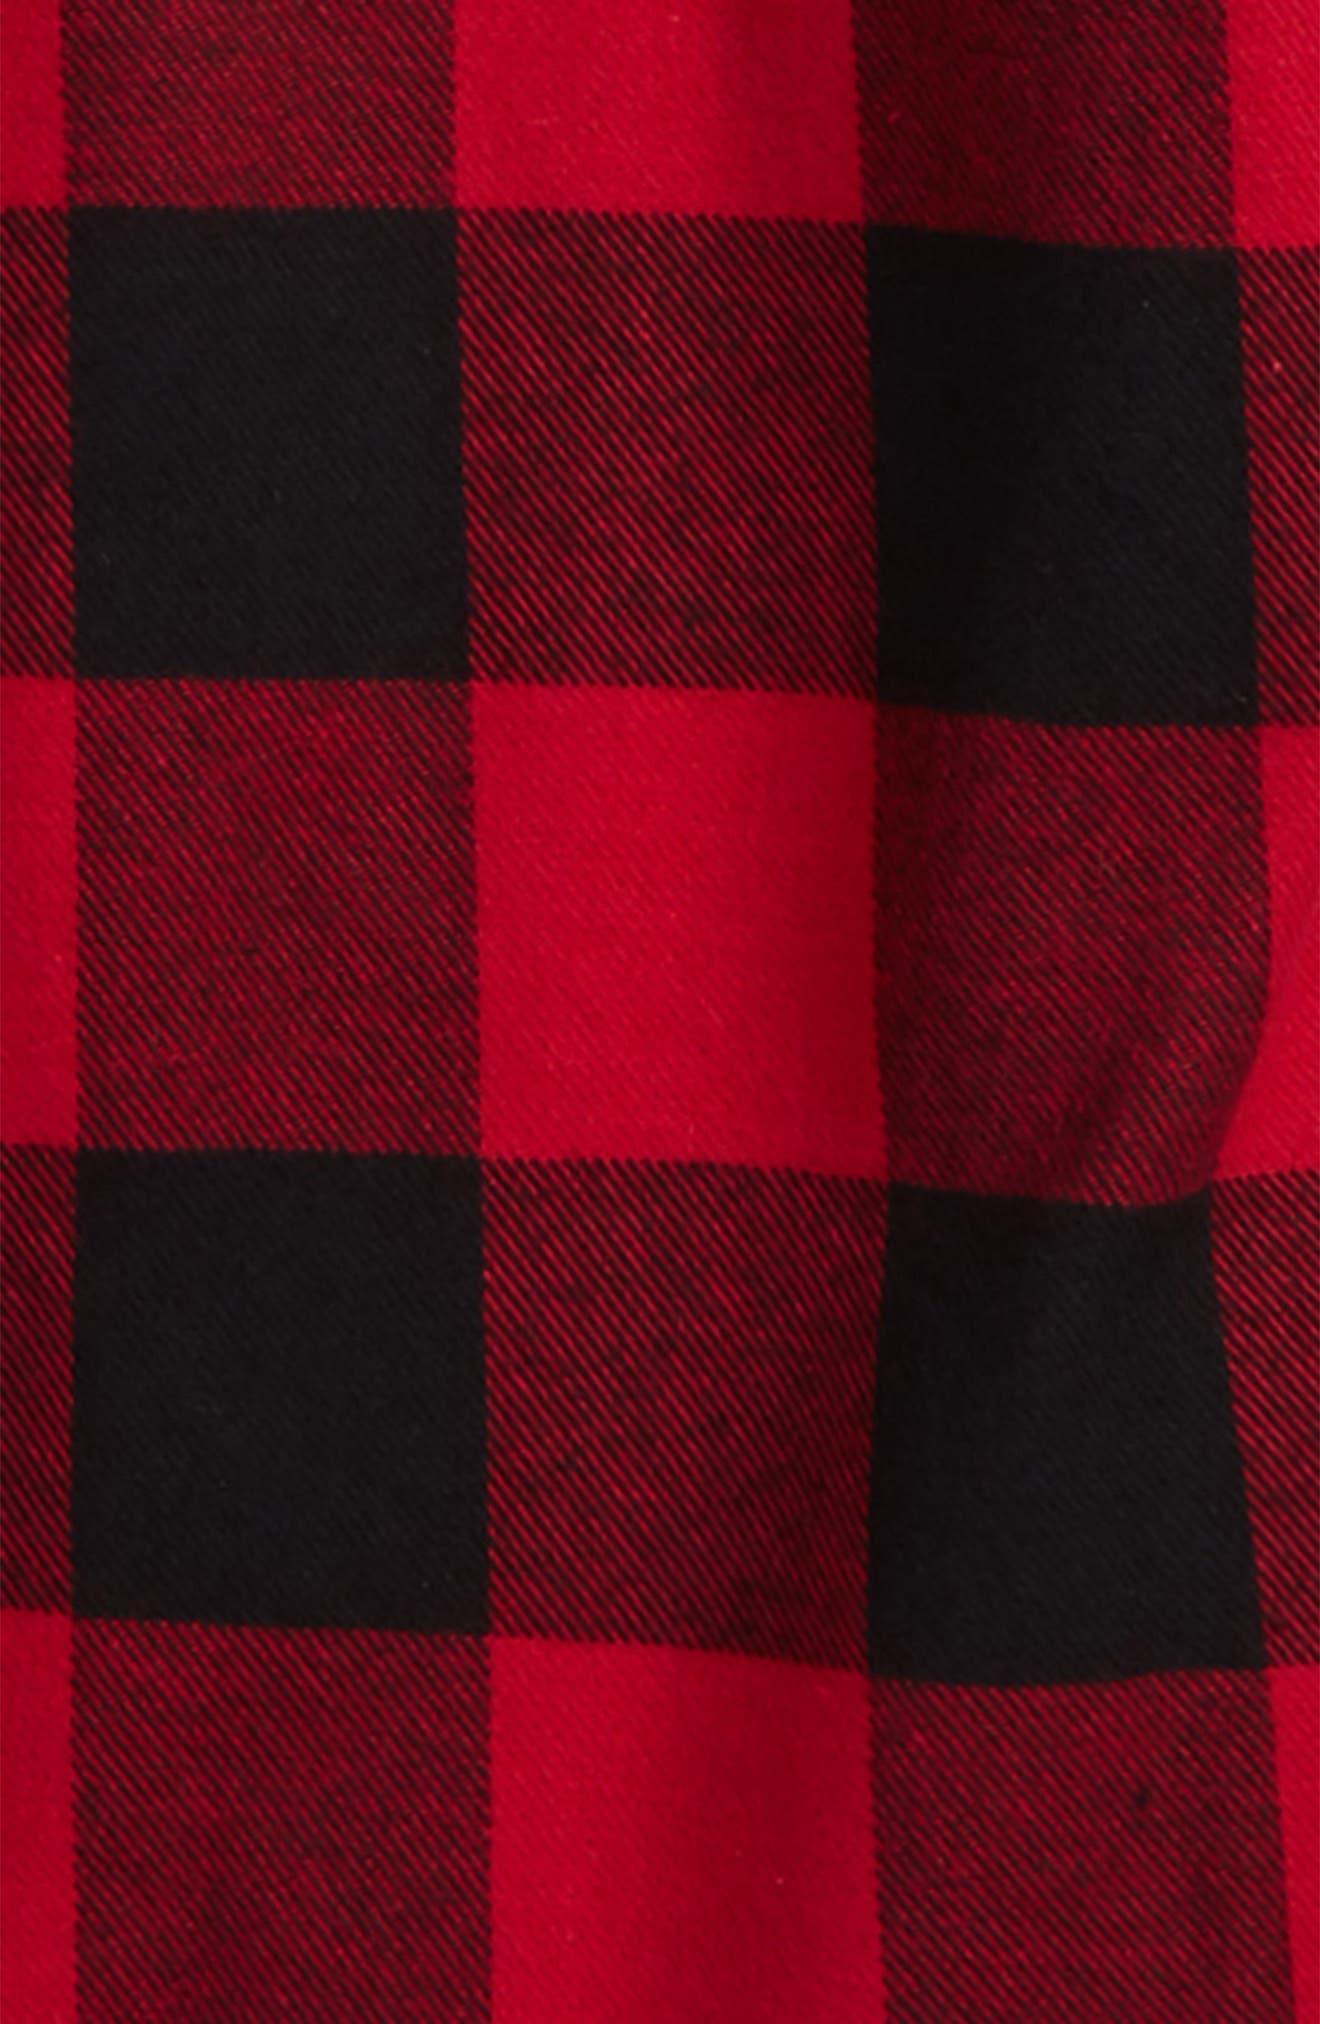 Buffalo Check Woven Shirt,                             Alternate thumbnail 2, color,                             610